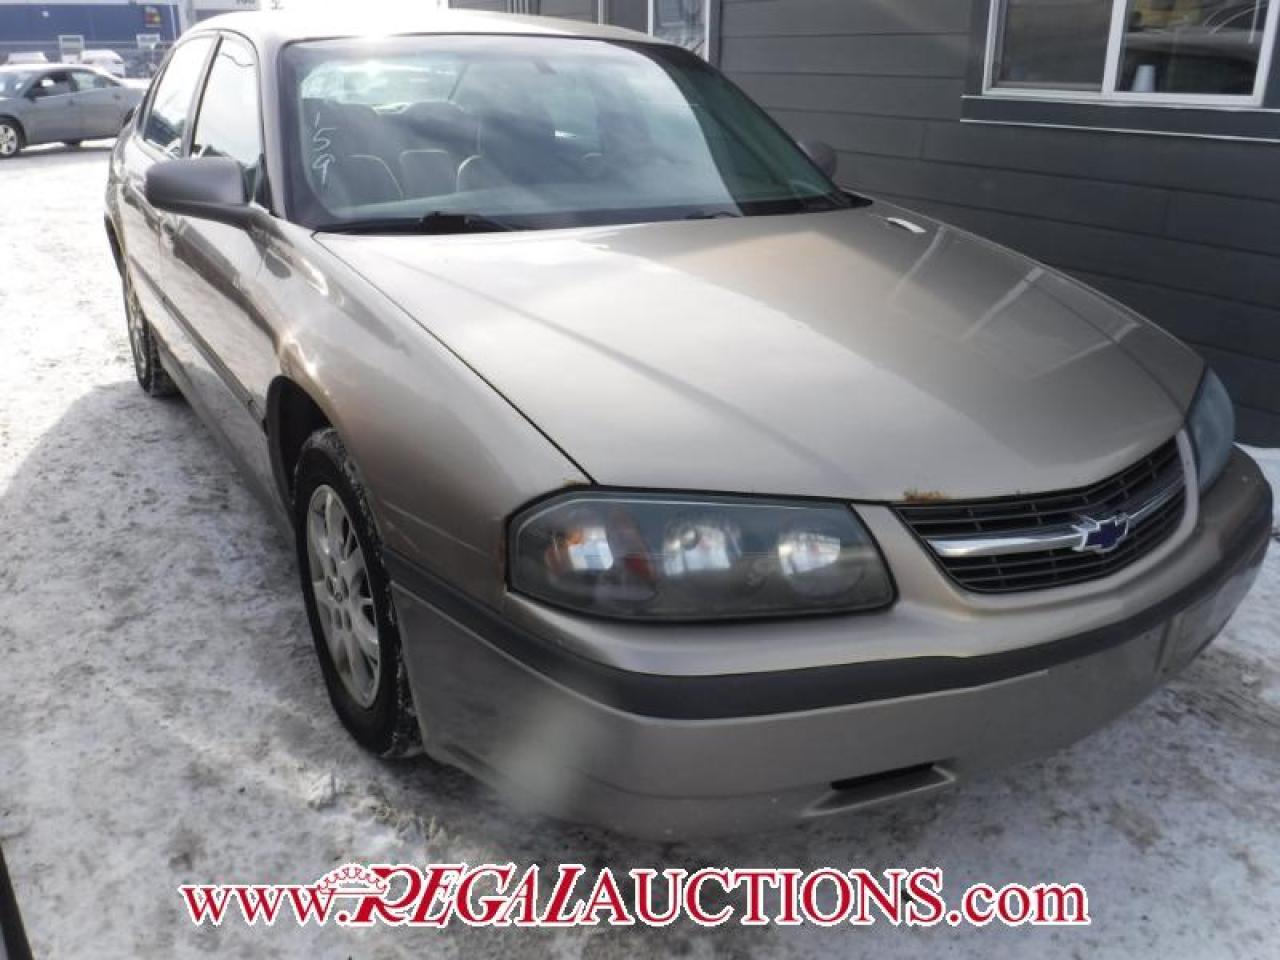 Photo of Tan 2001 Chevrolet IMPALA BASE 4D SEDAN